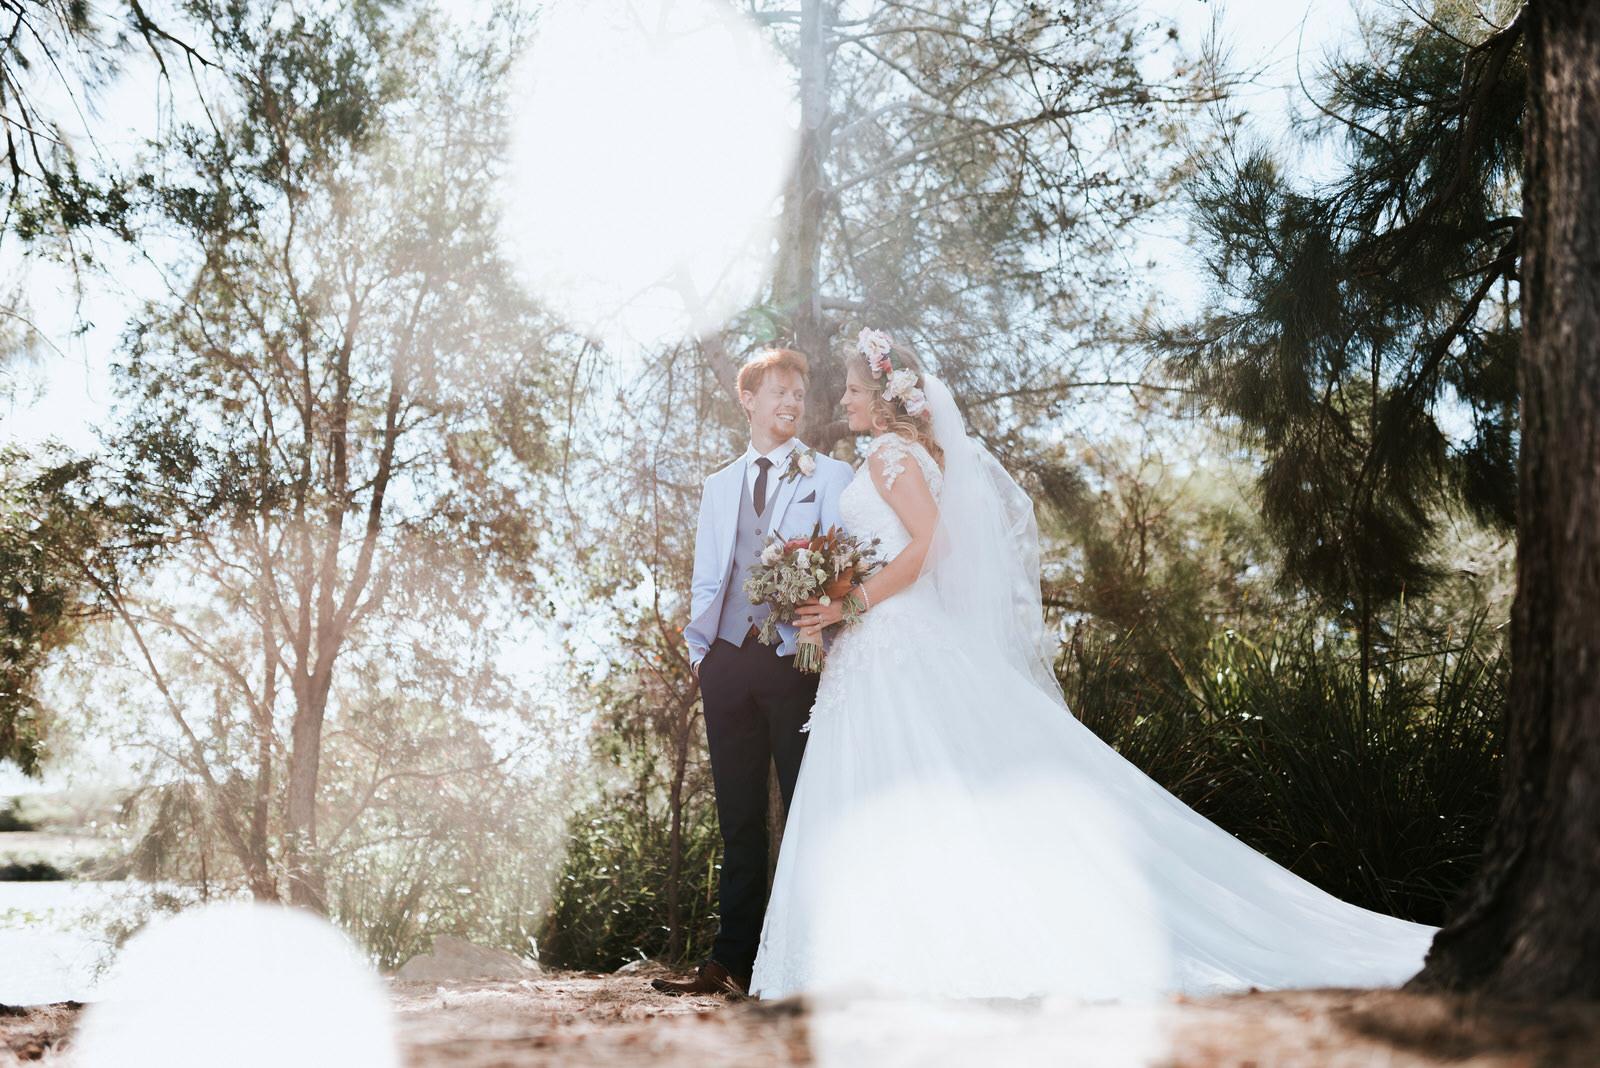 20180414 - Kaylee & Matthew 0223.jpg